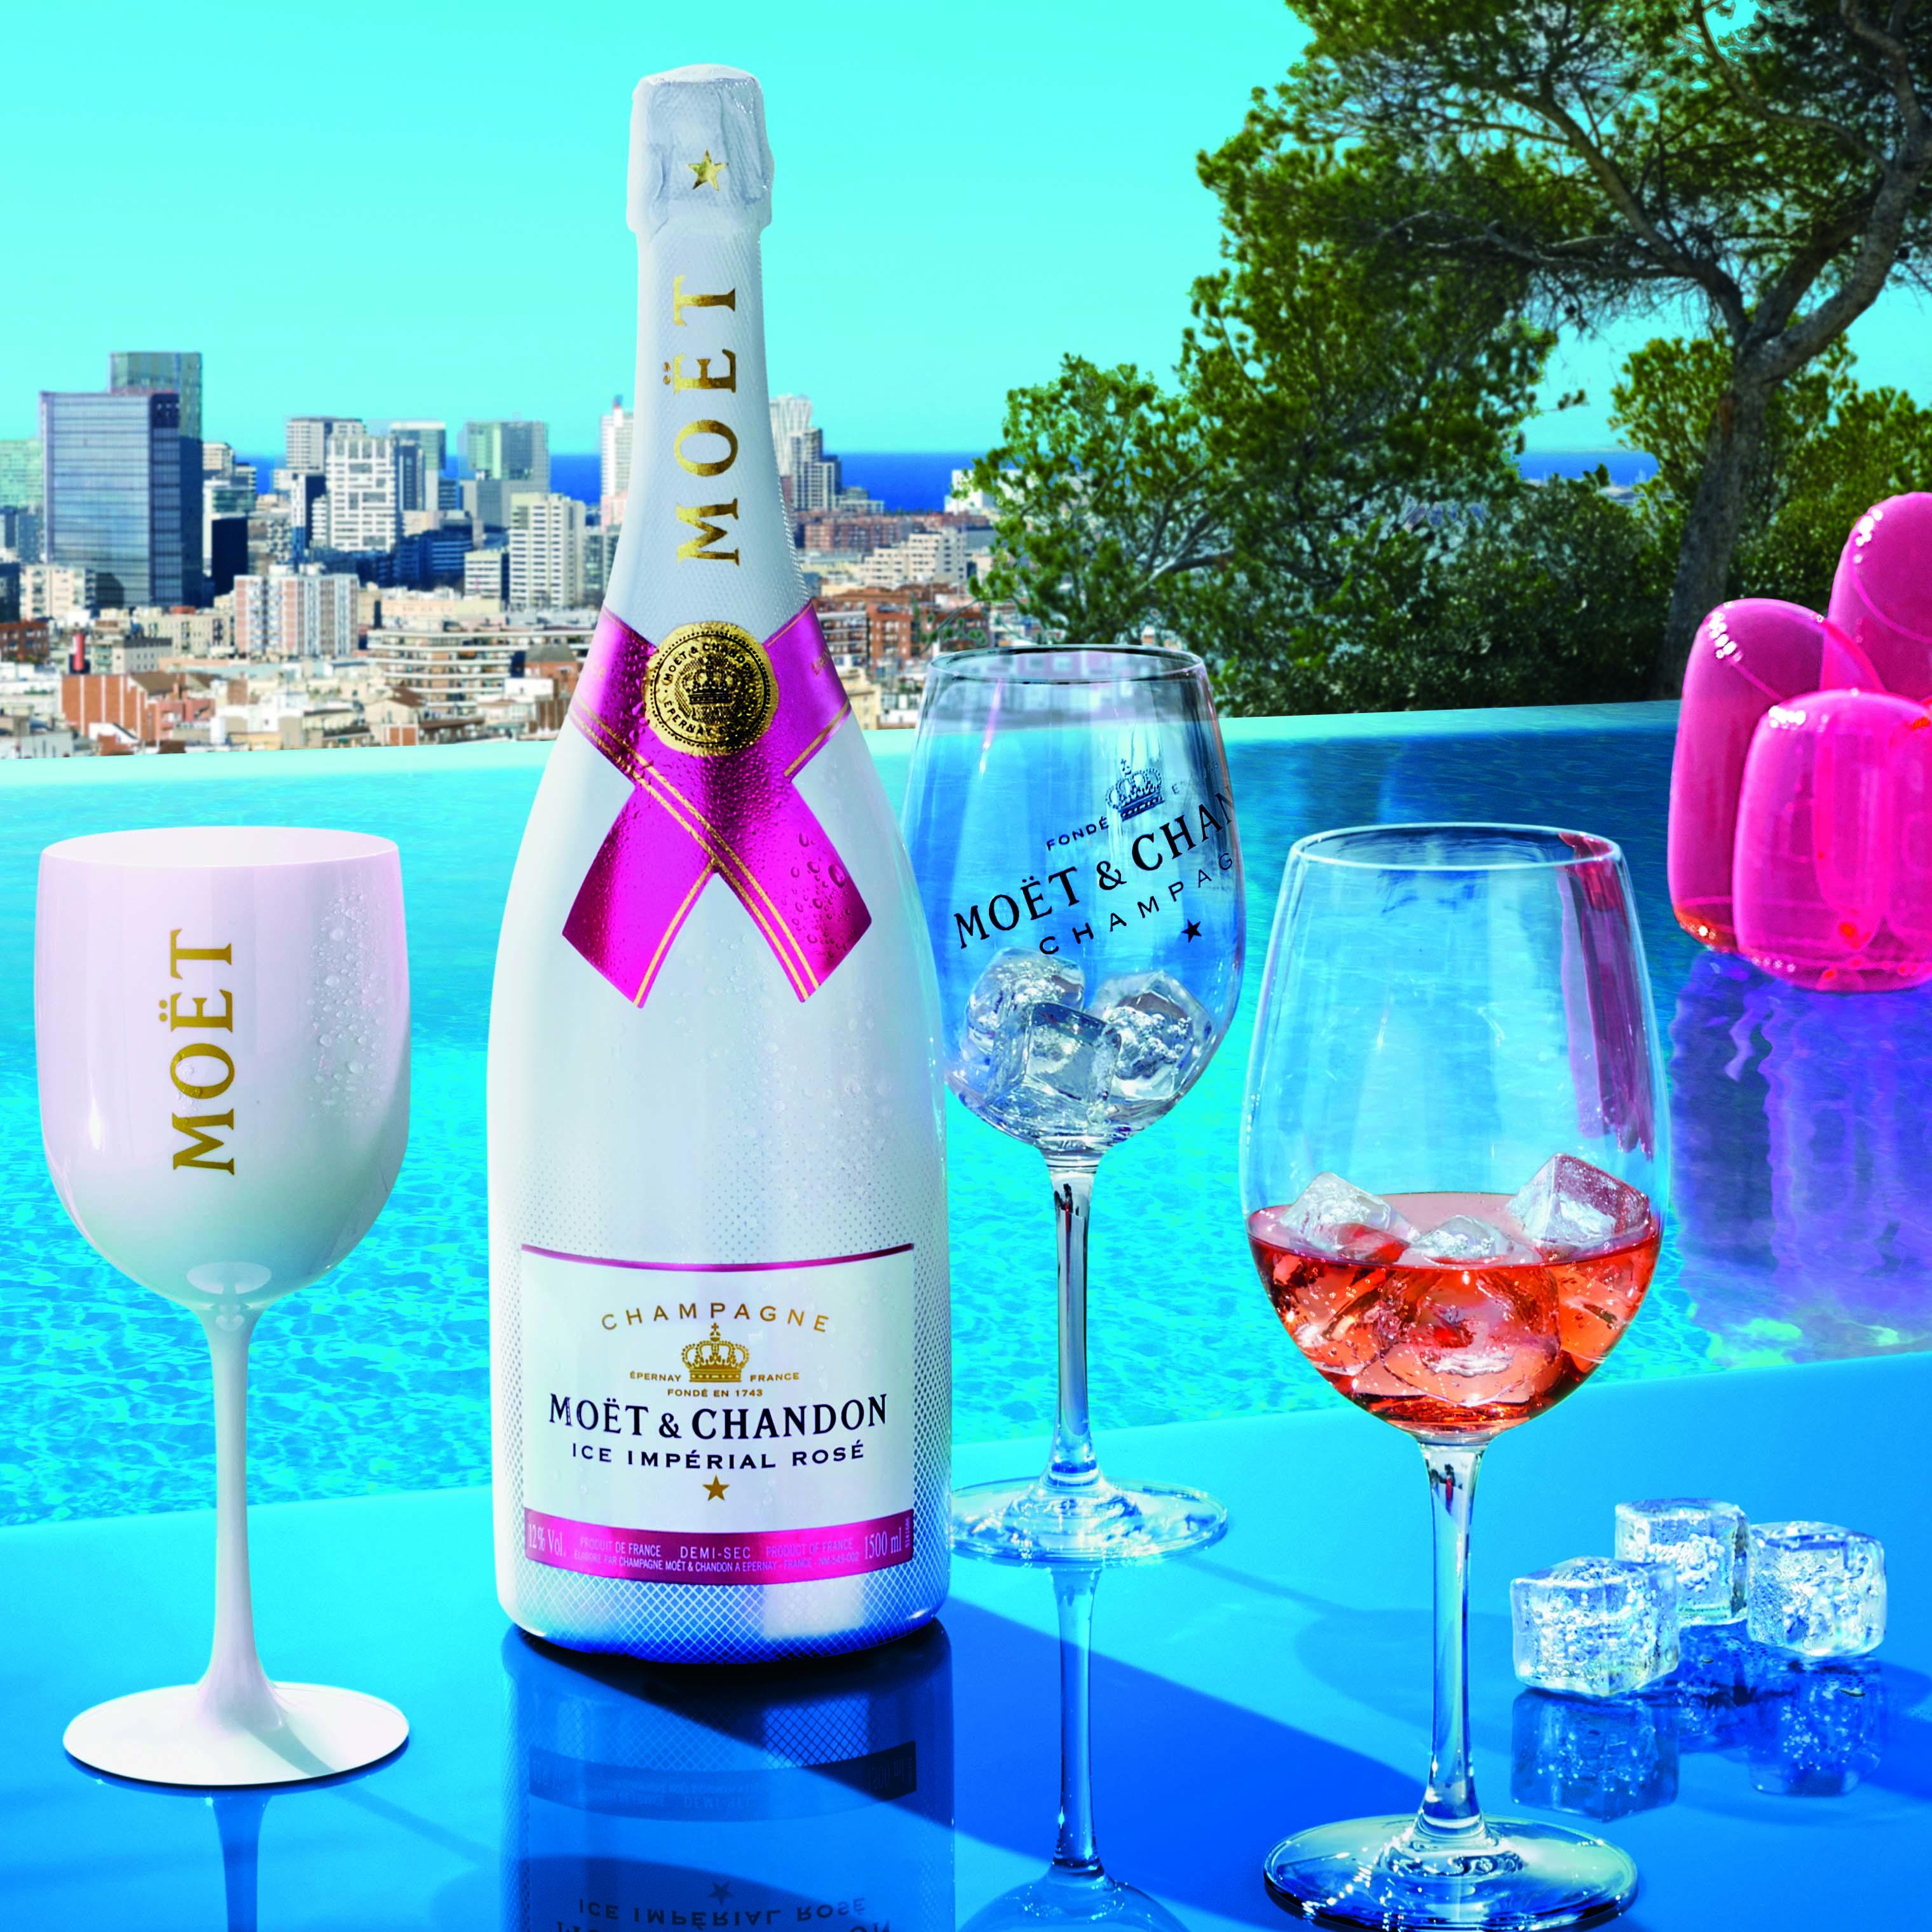 Champagne Moet Ice Imperial Rose migliori bottiglie